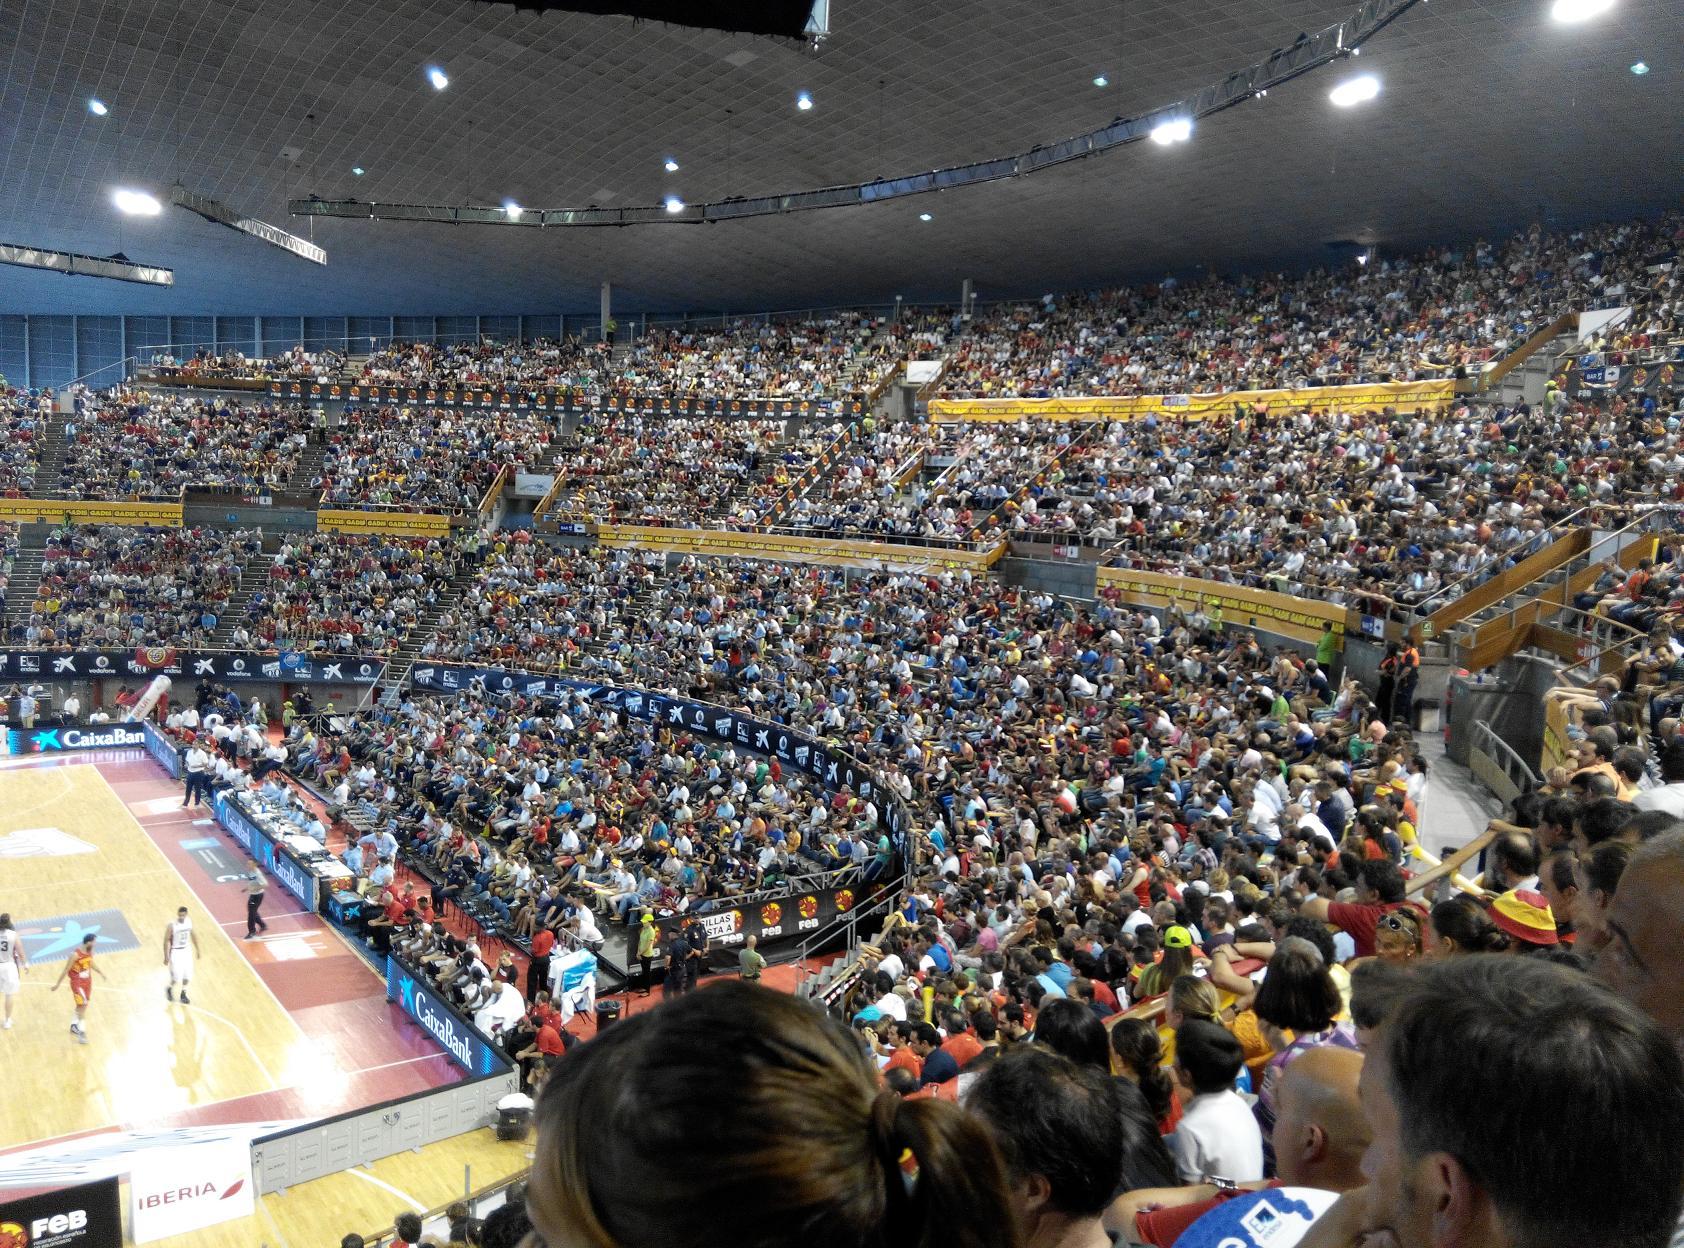 Coliseum de A Coruña Partifo de la selecci´pon Española de Baloncesto